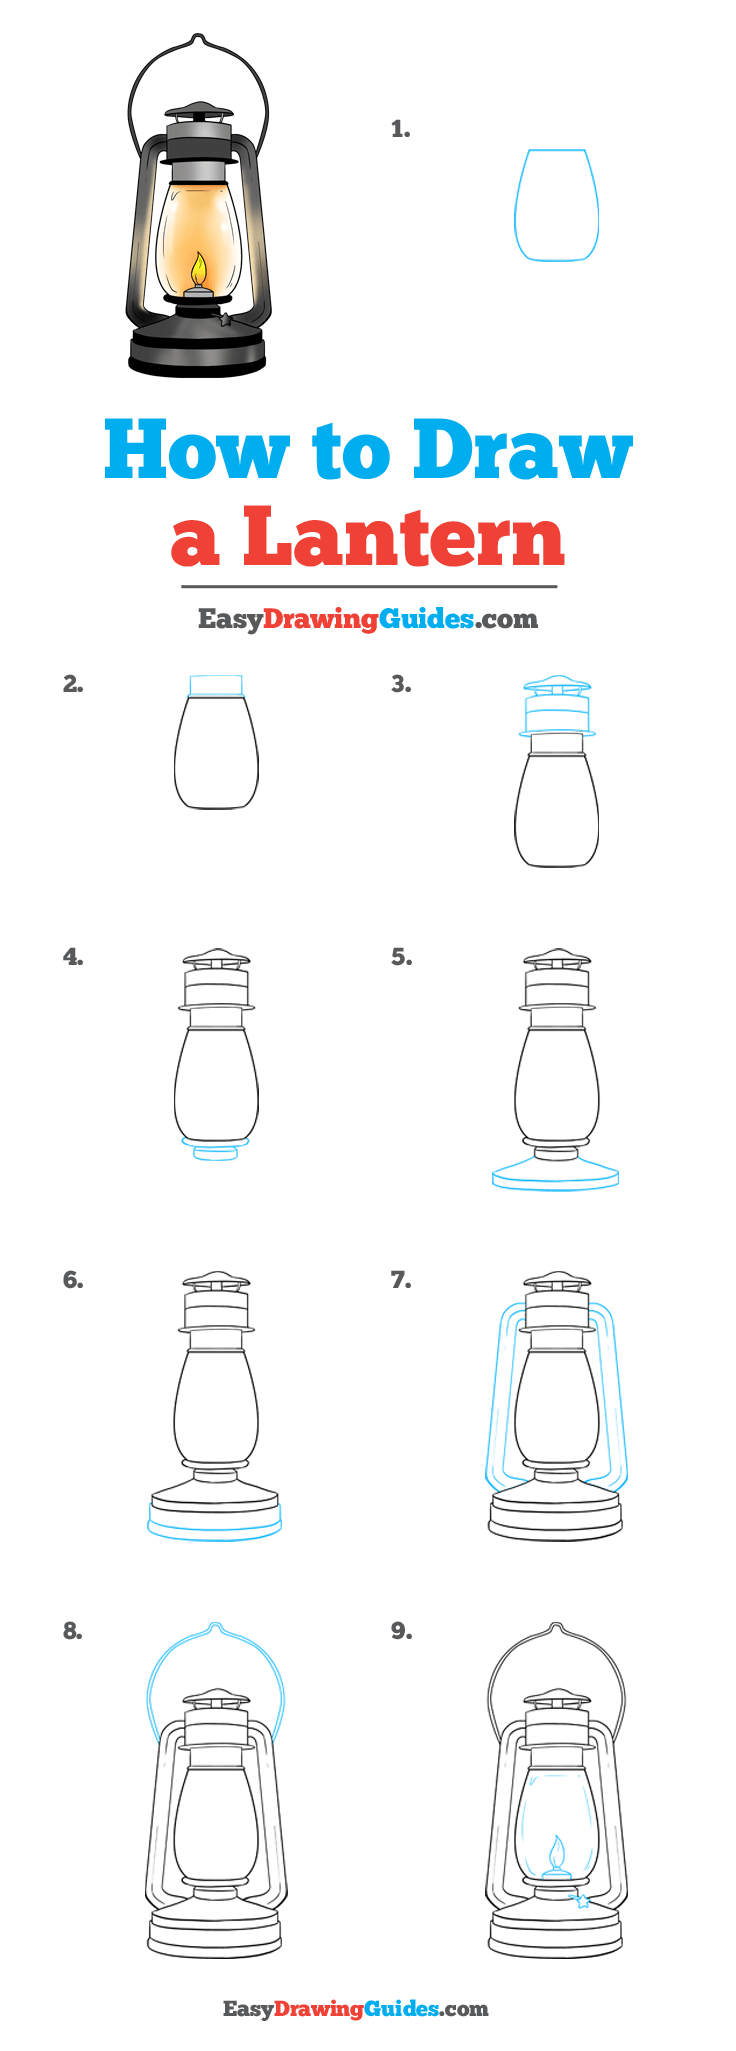 How to Draw Lantern